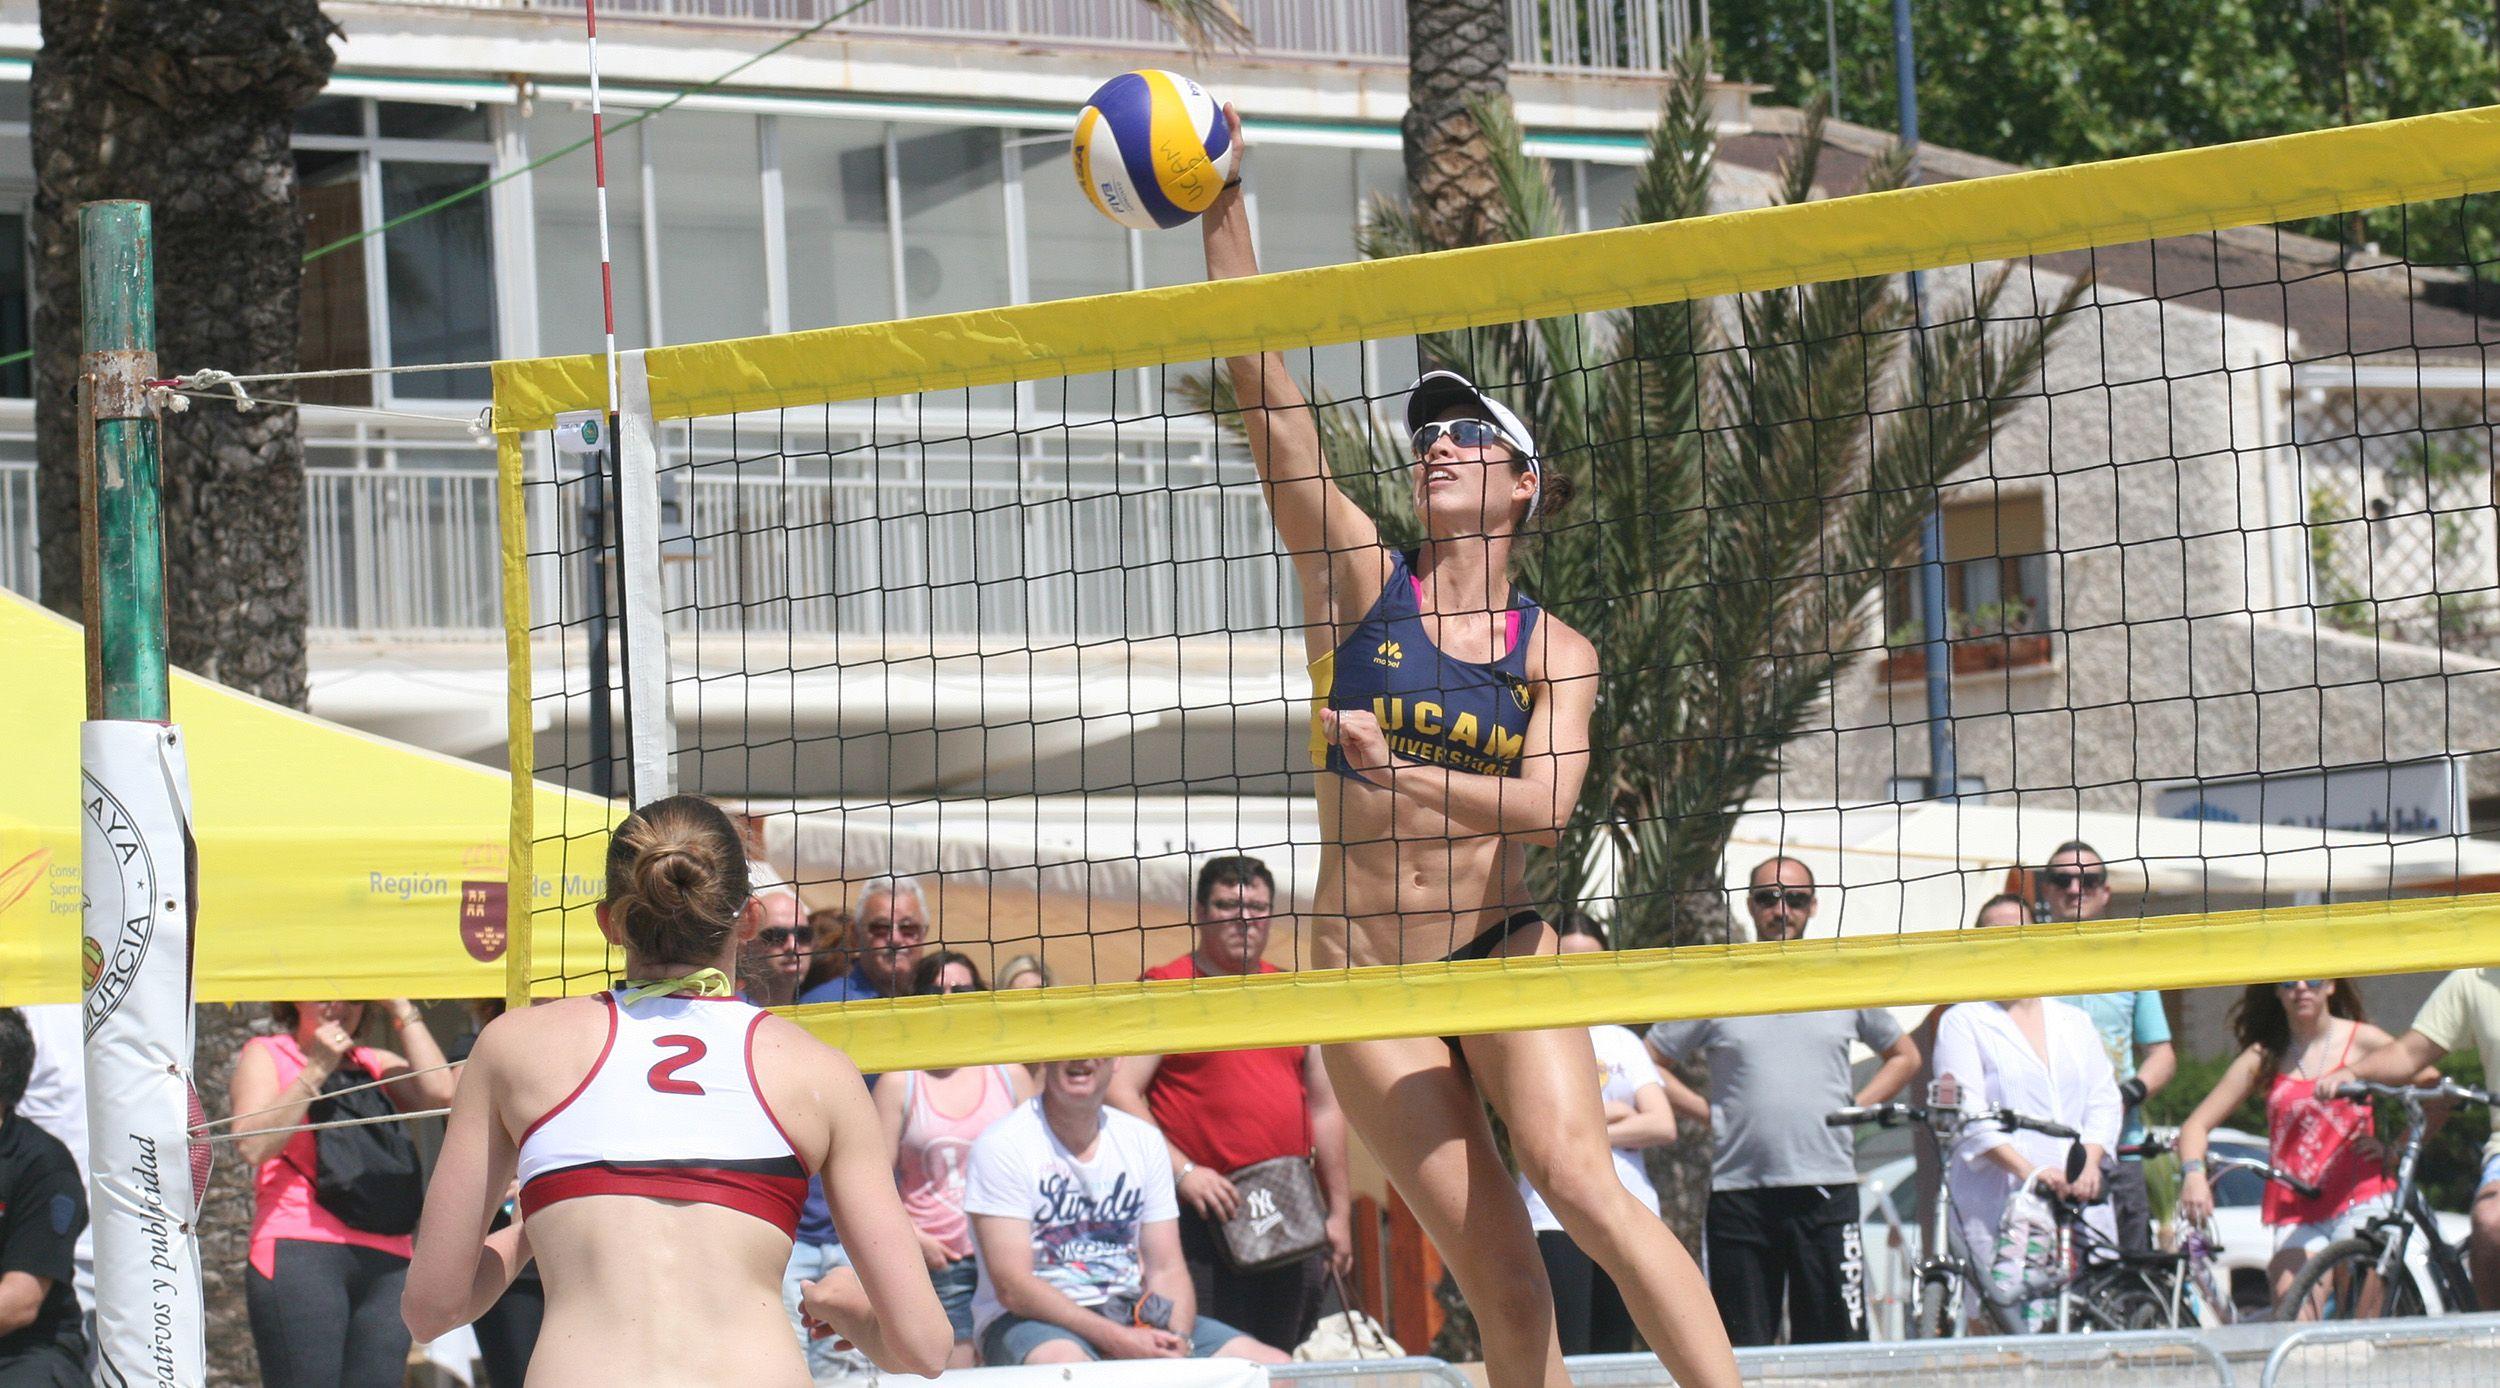 Beach Volley | Beach Volley Tour | Página 3 | Beach Volley Tour - Part 3